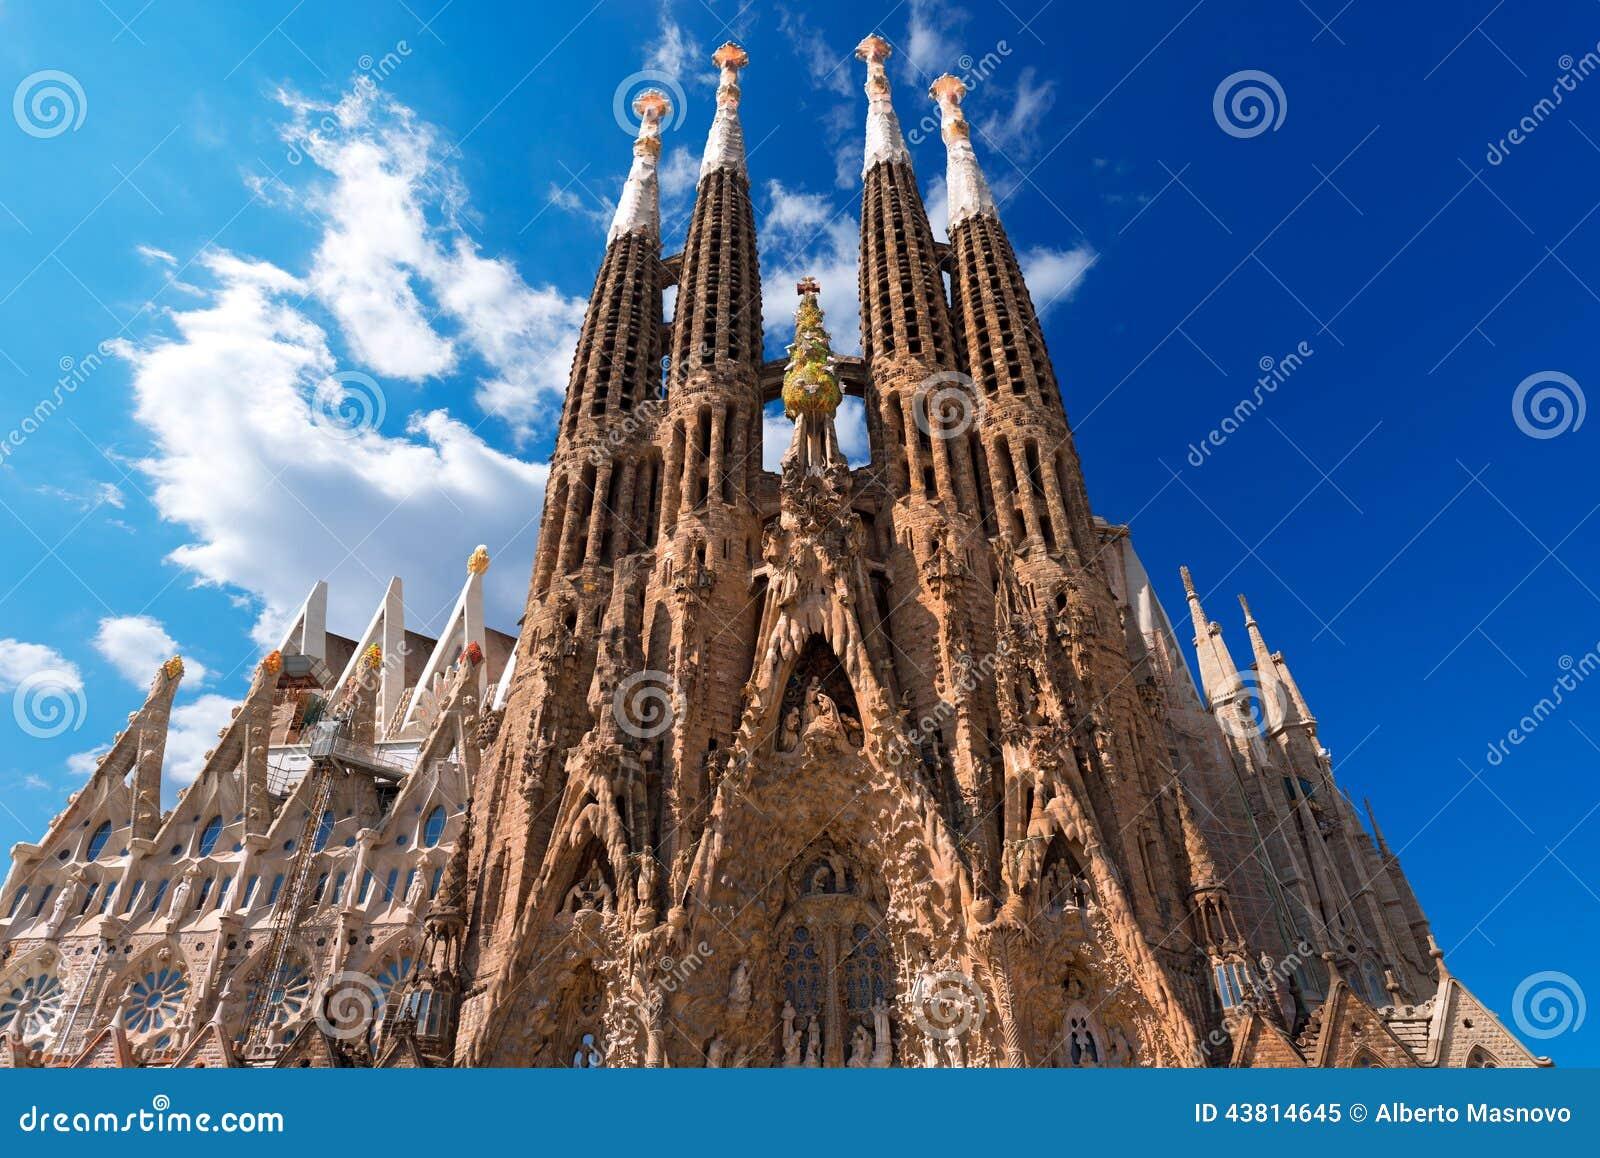 Temple Expiatori de la Sagrada Familia - Barcelona Spain